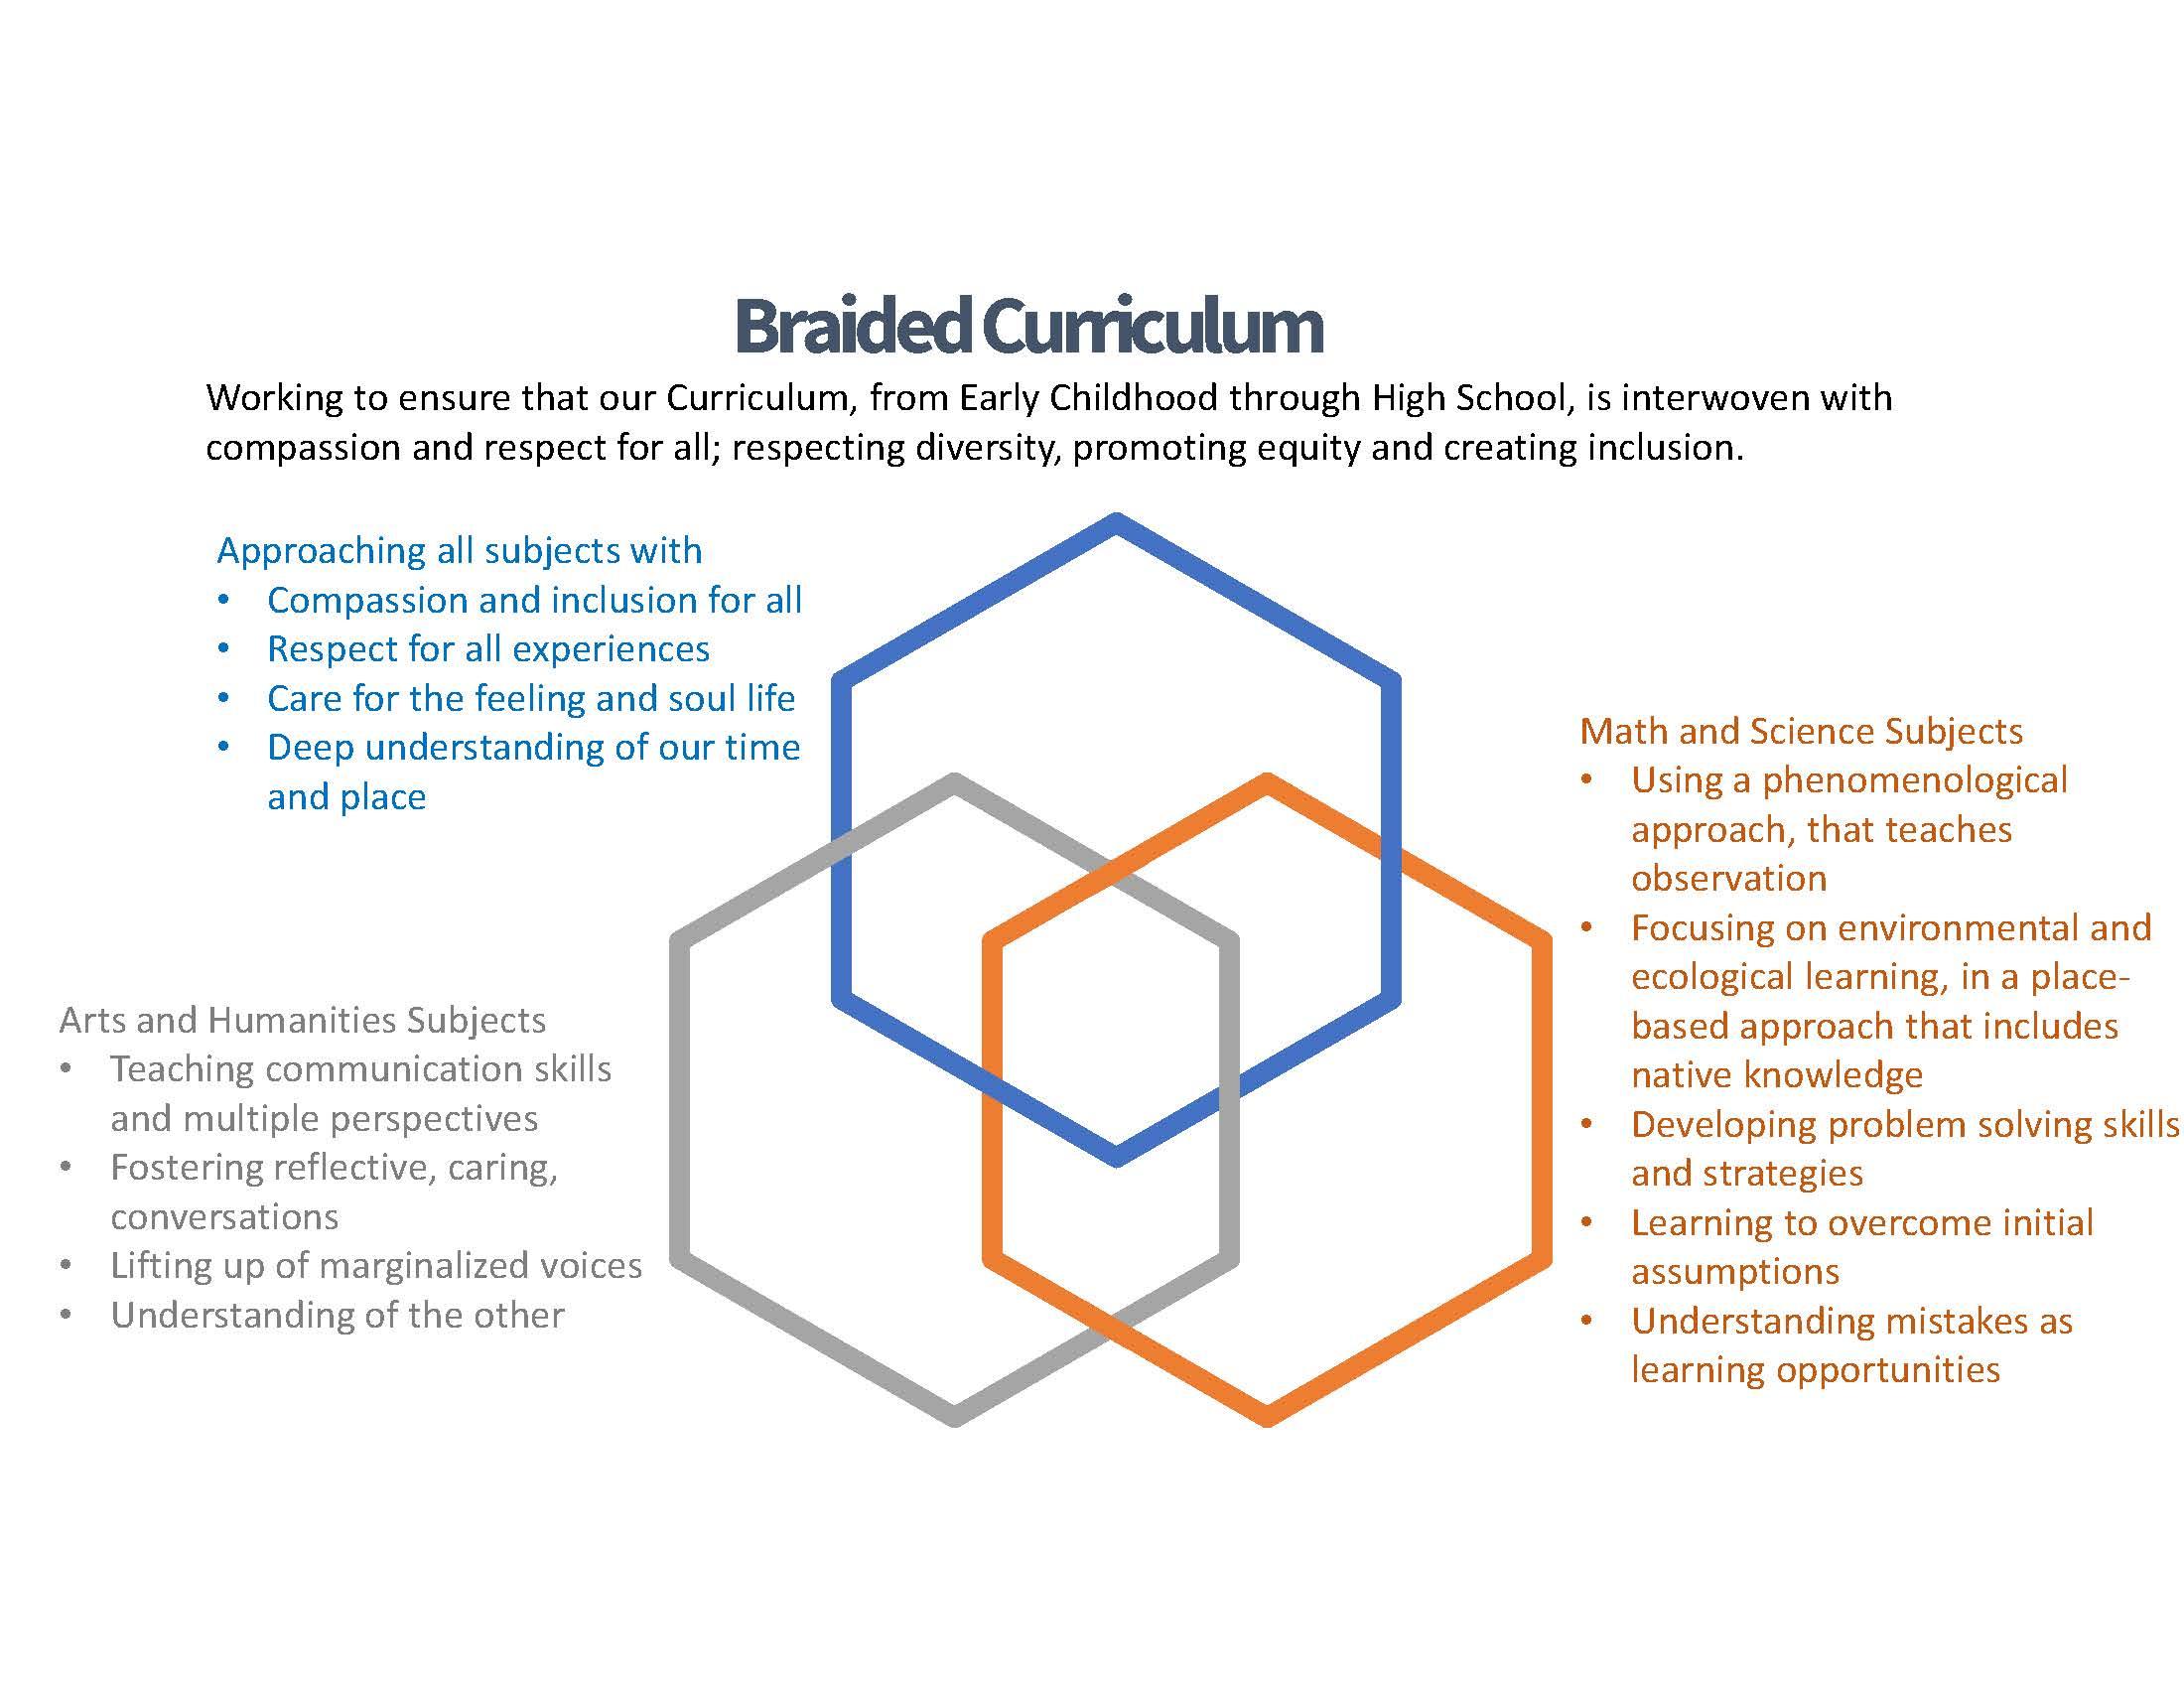 Our Braided Curriculum